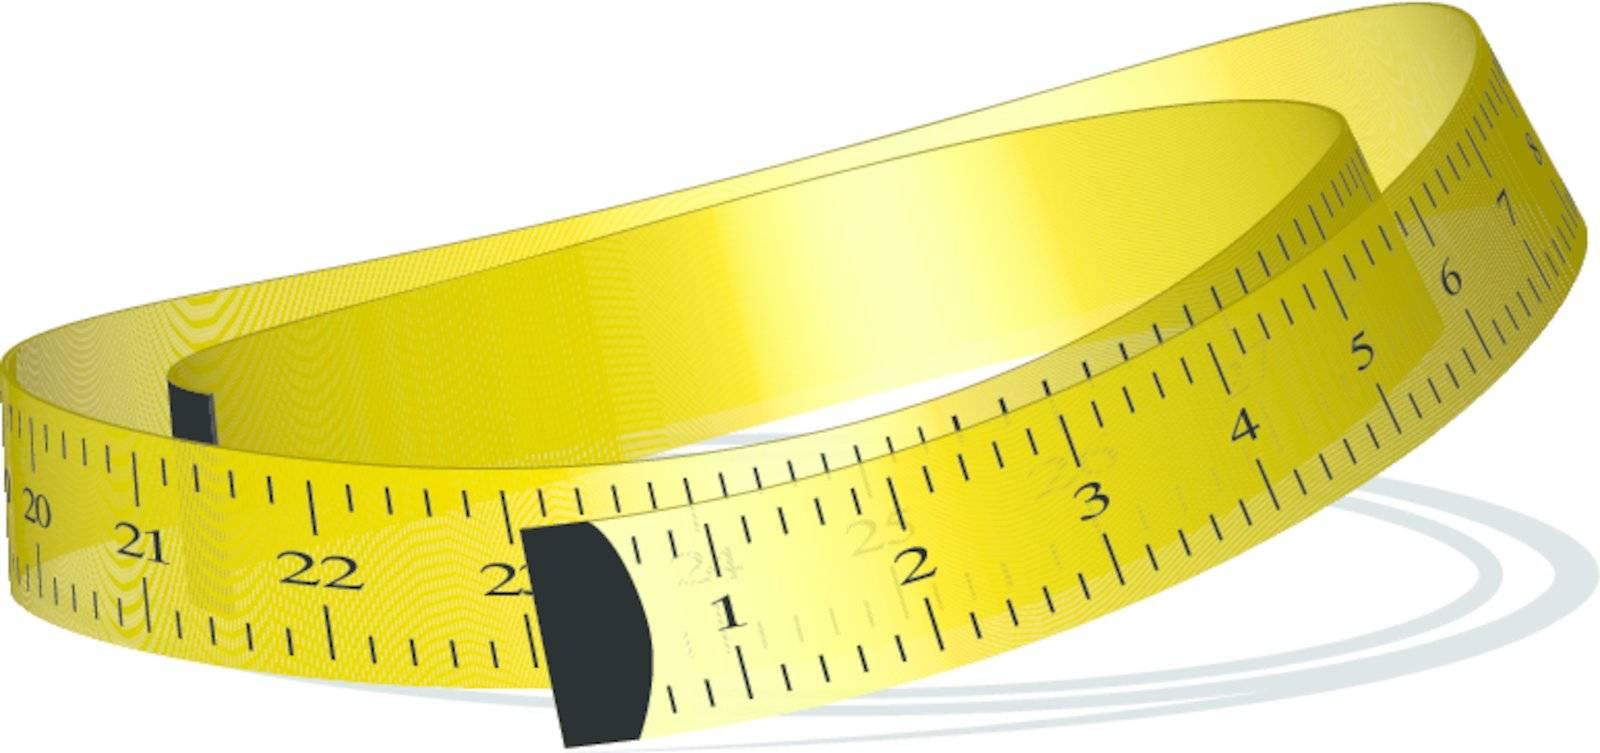 yellow measuring tape against white background, vector art illustration